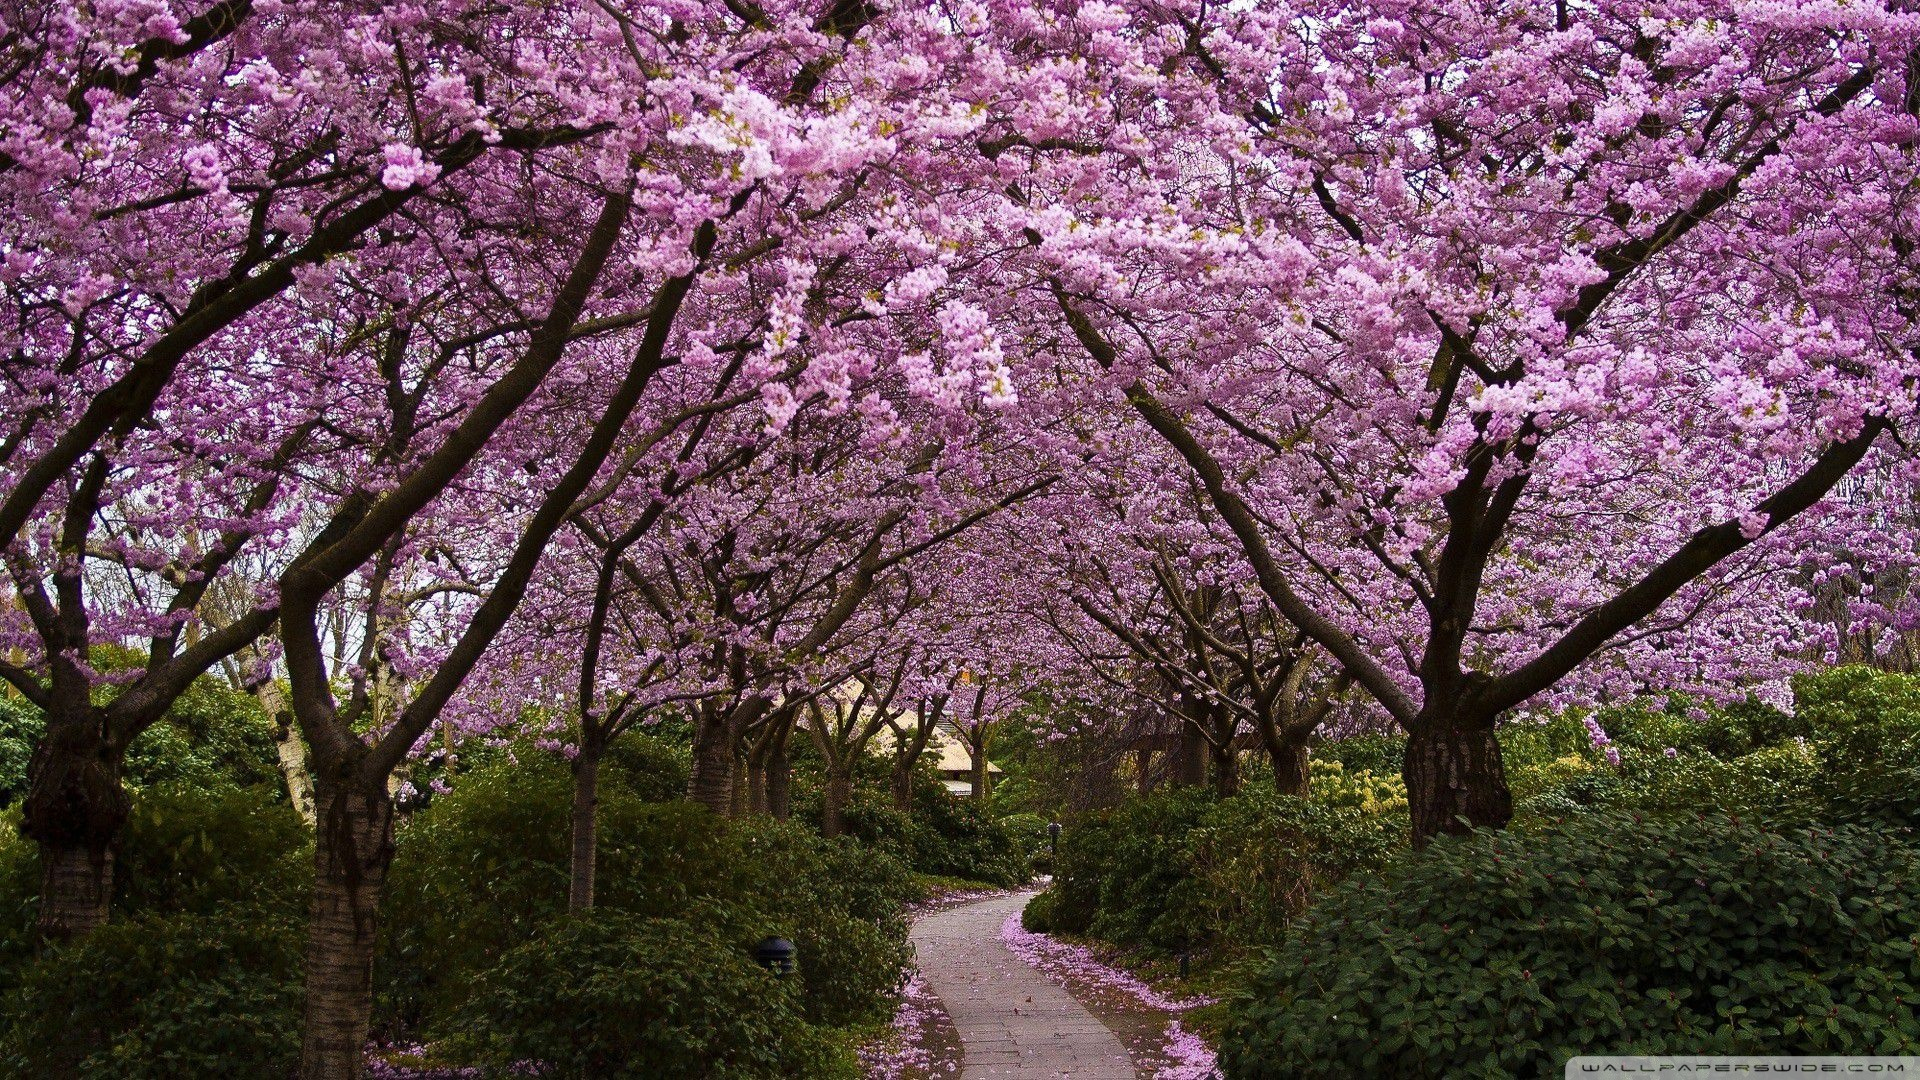 spring_pink_trees-wallpaper-1920x1080